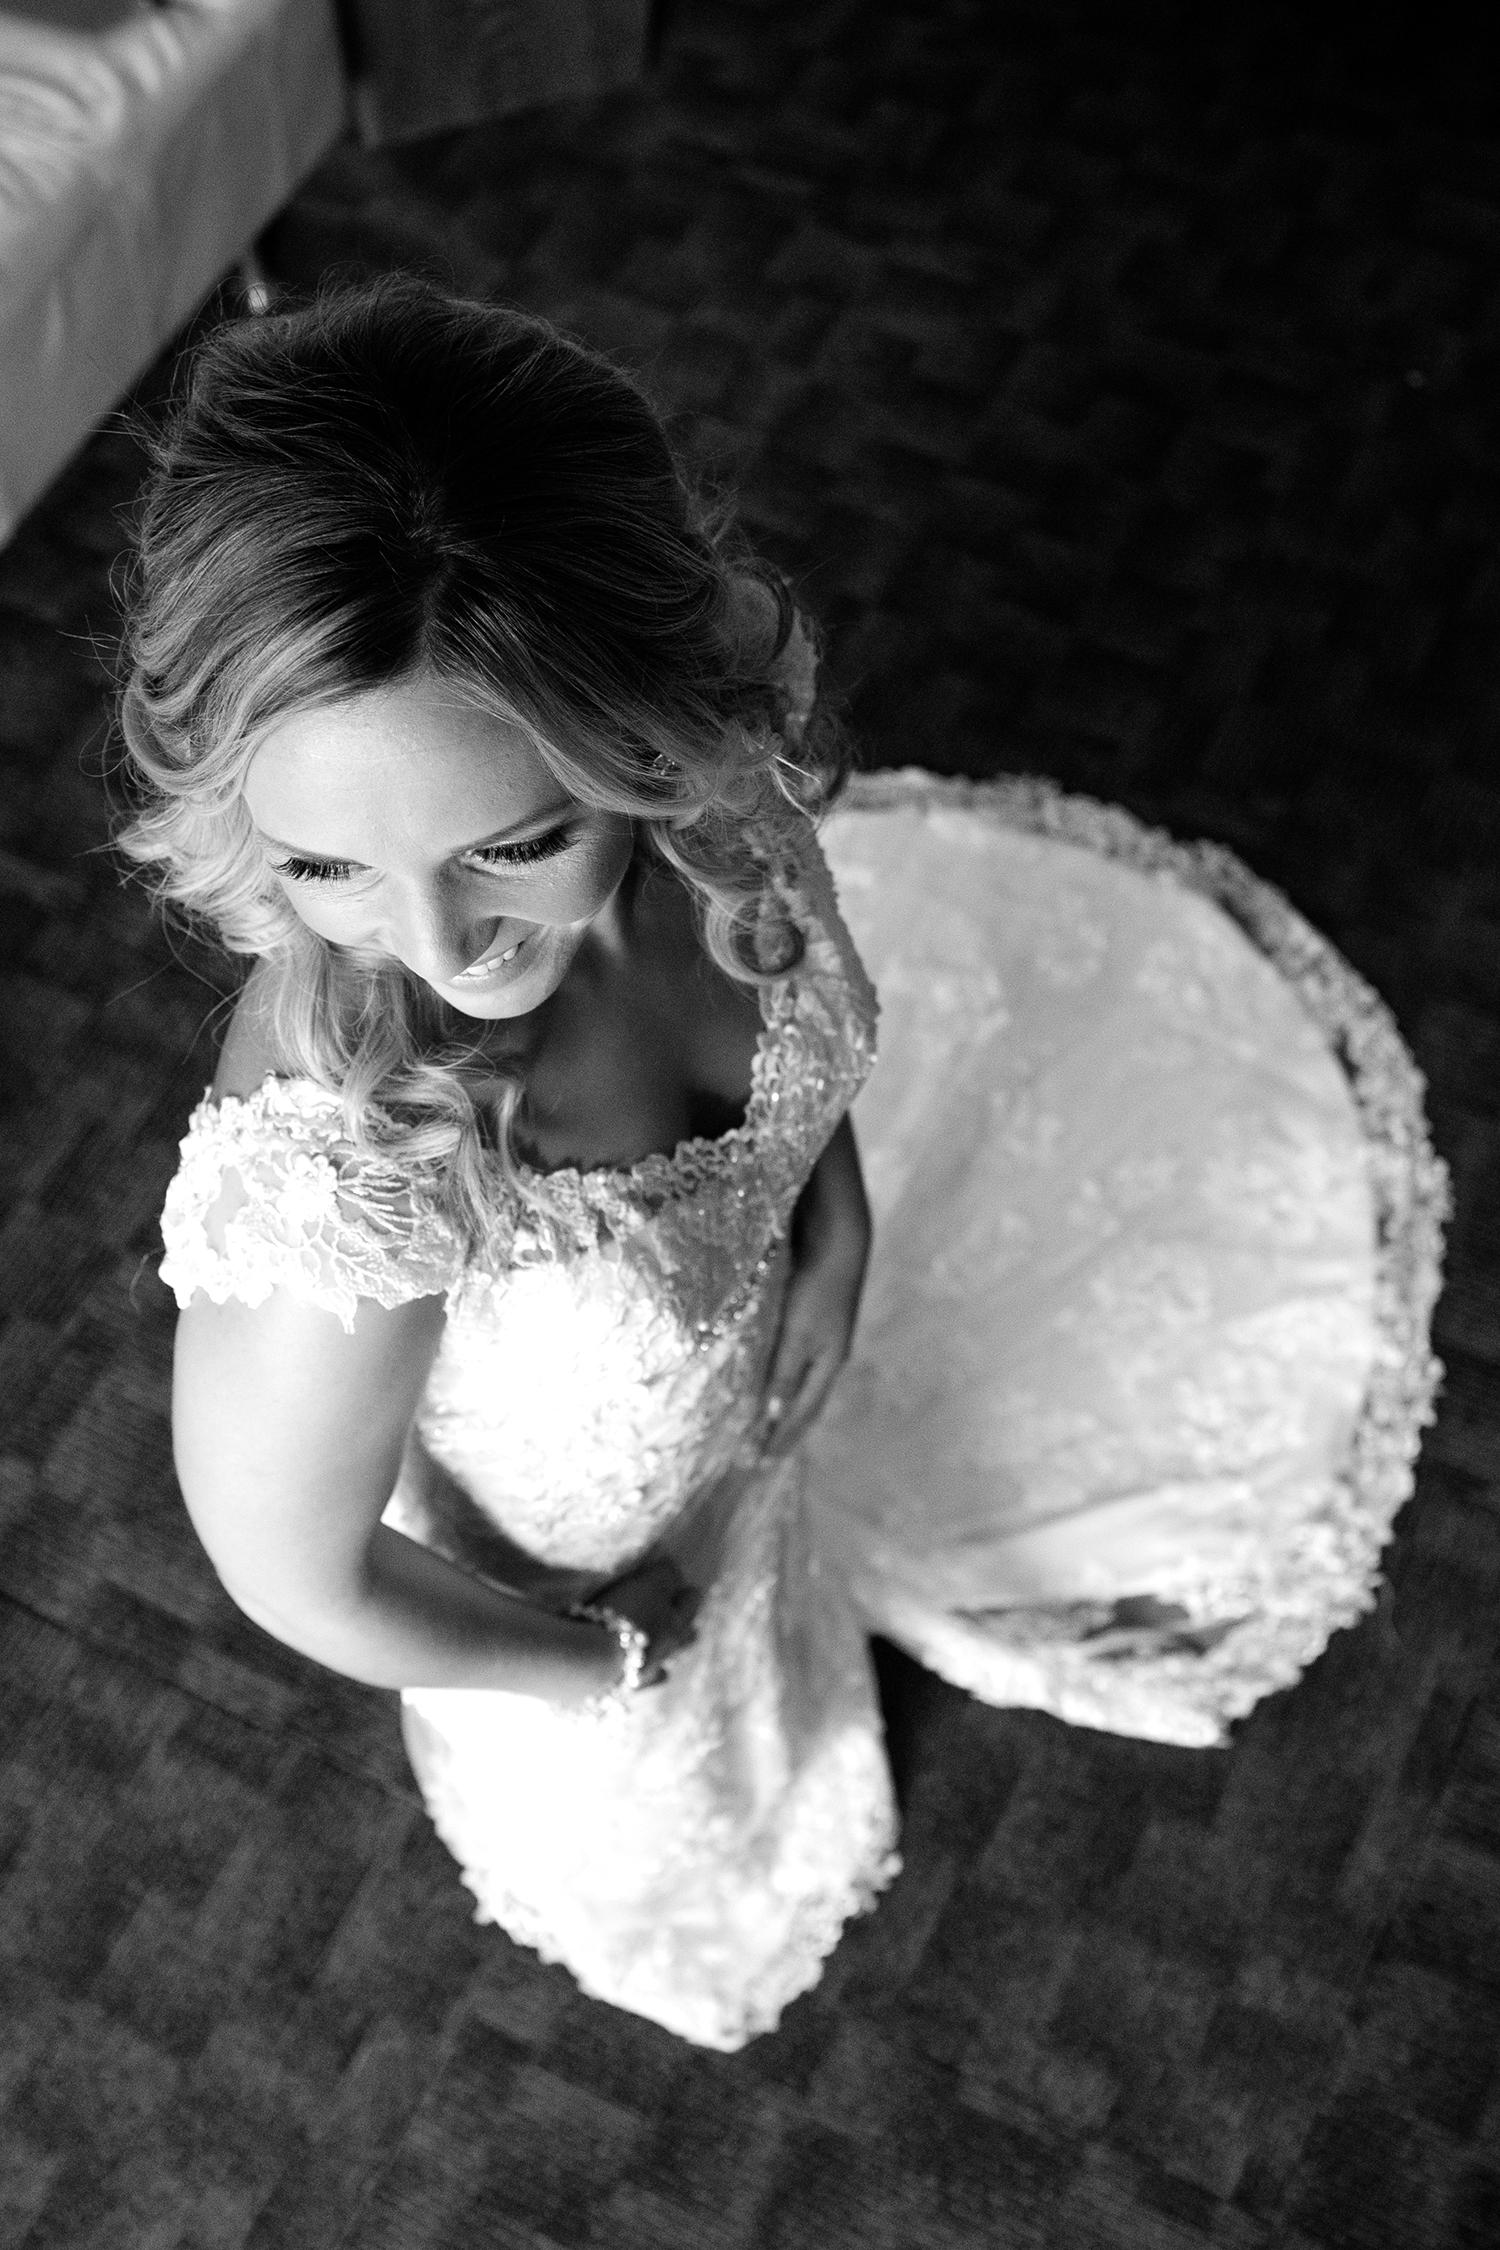 lake-tahoe-wedding-photographer-kevin-sawyer-photograph-truckee-photographer- (10).jpg